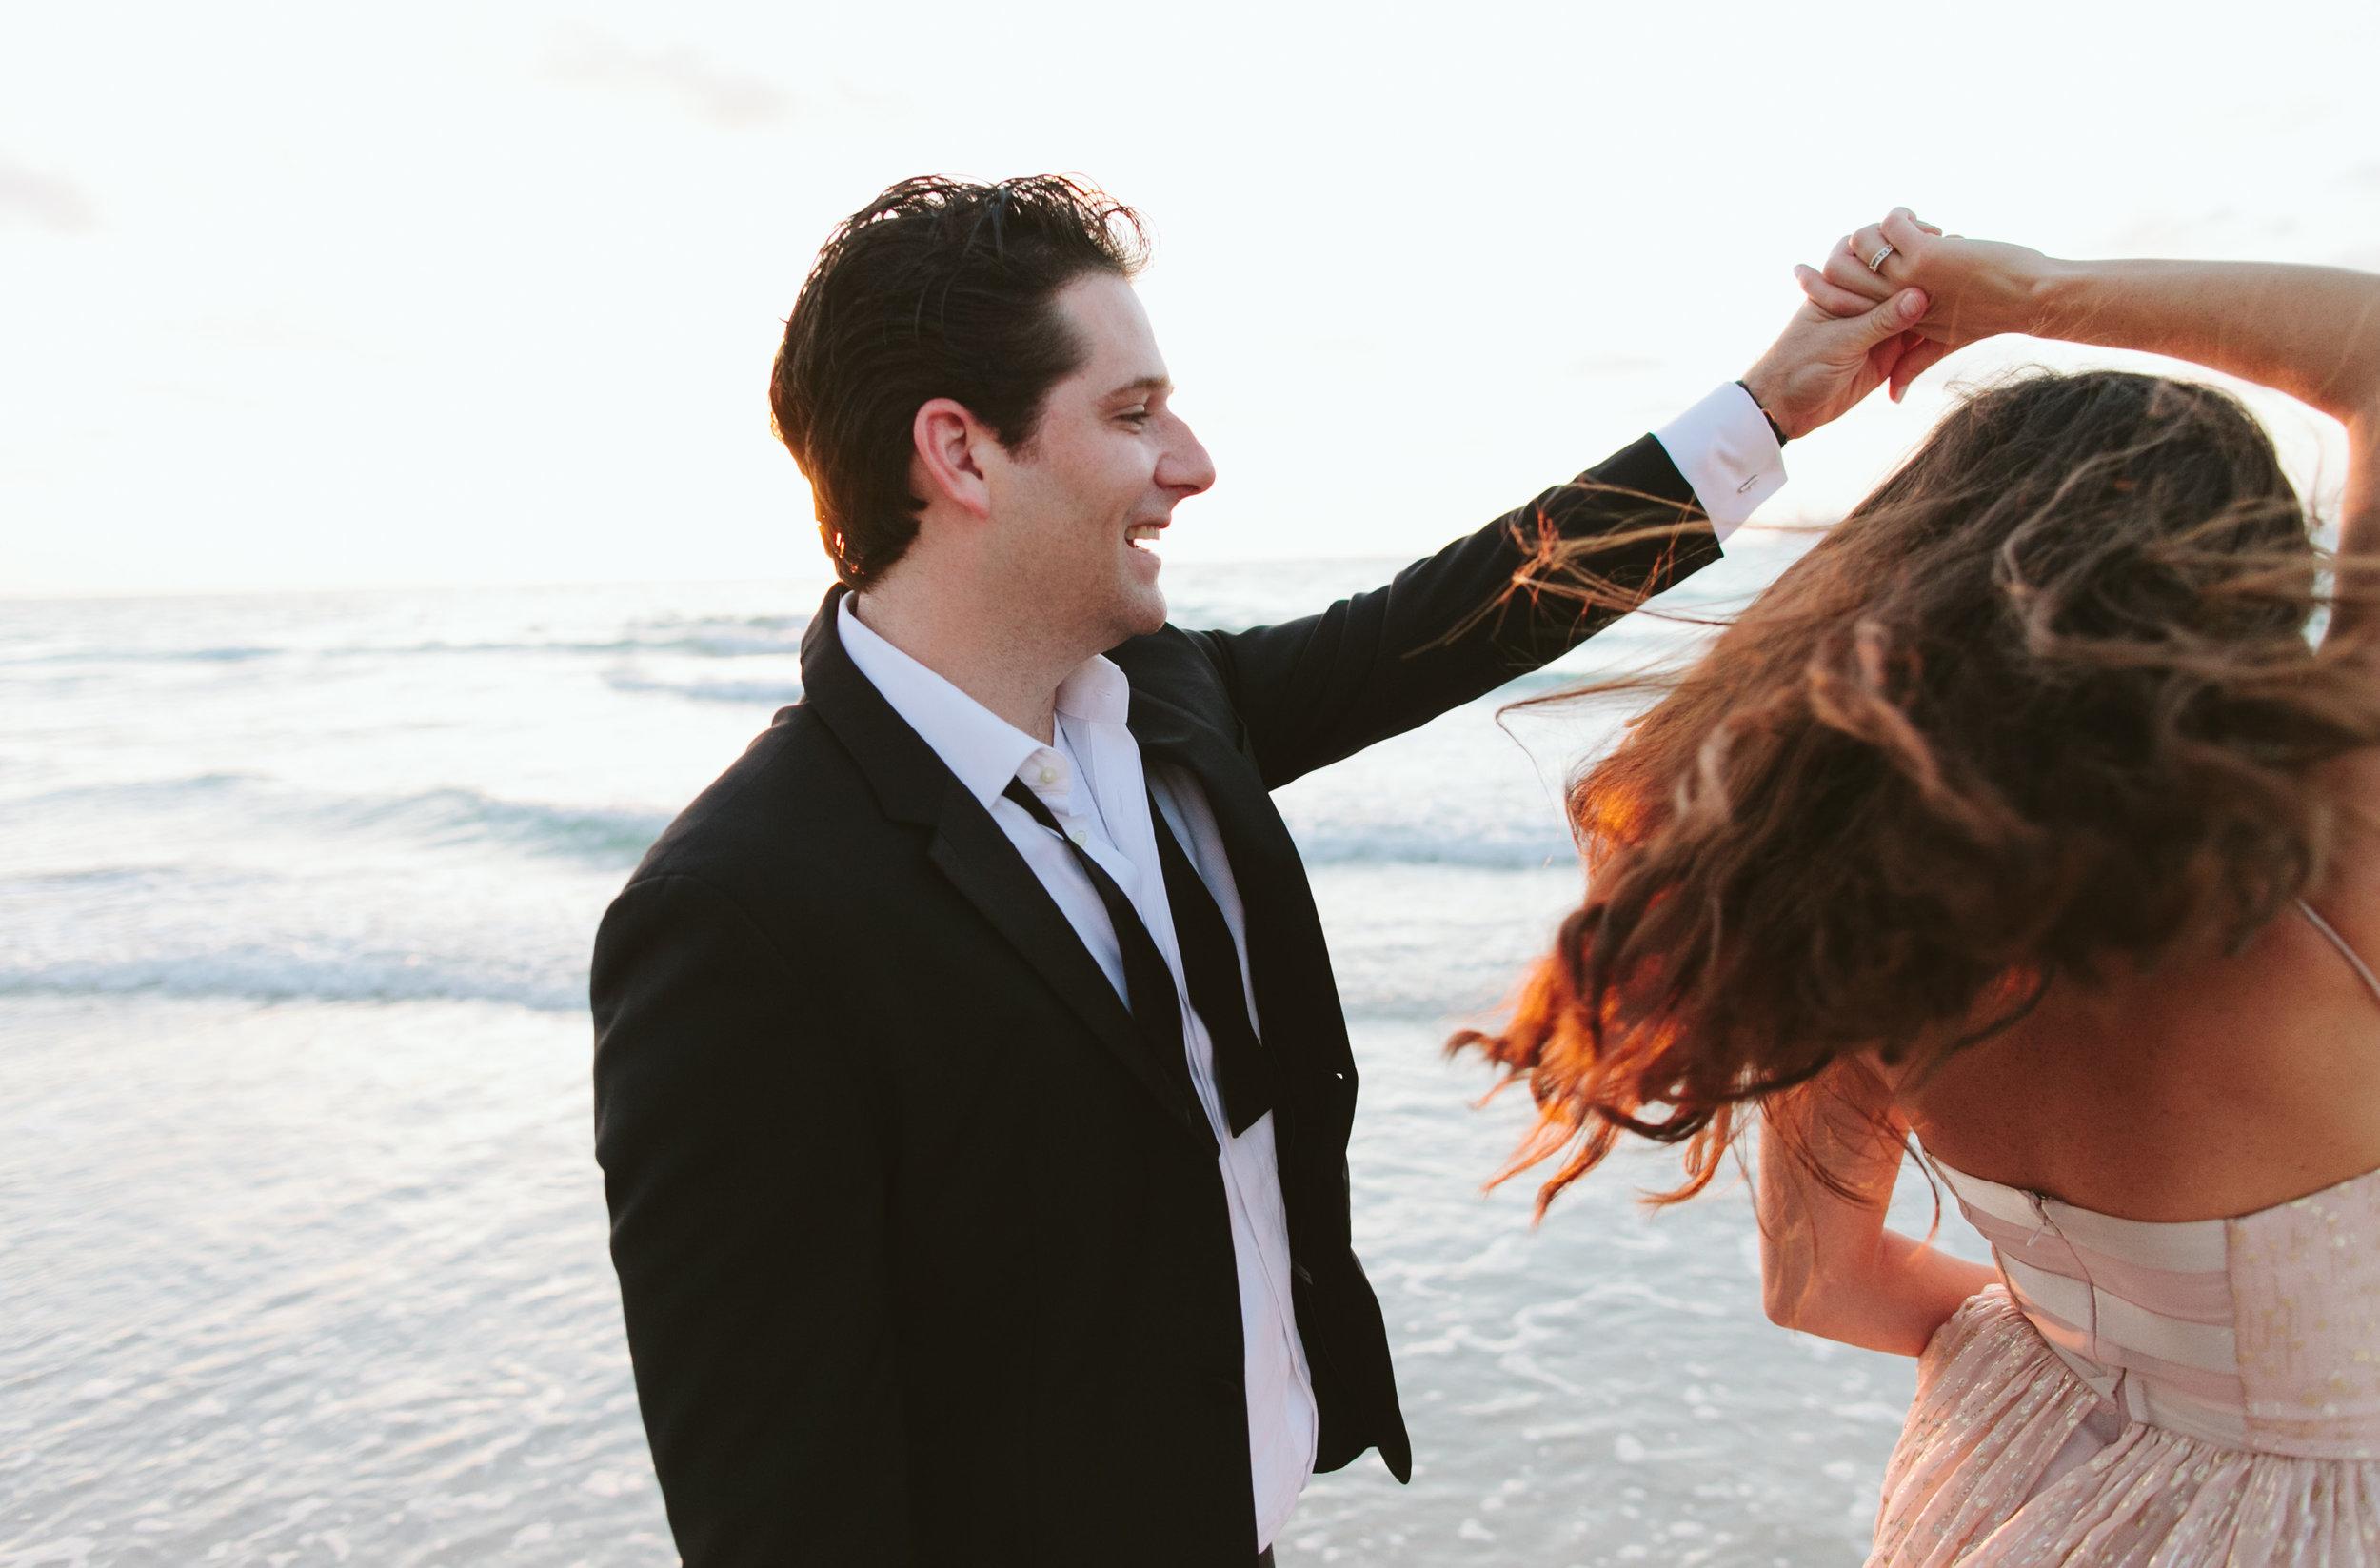 Meli + Mike South Pointe Park South Beach Miami Engagement Shoot20.jpg